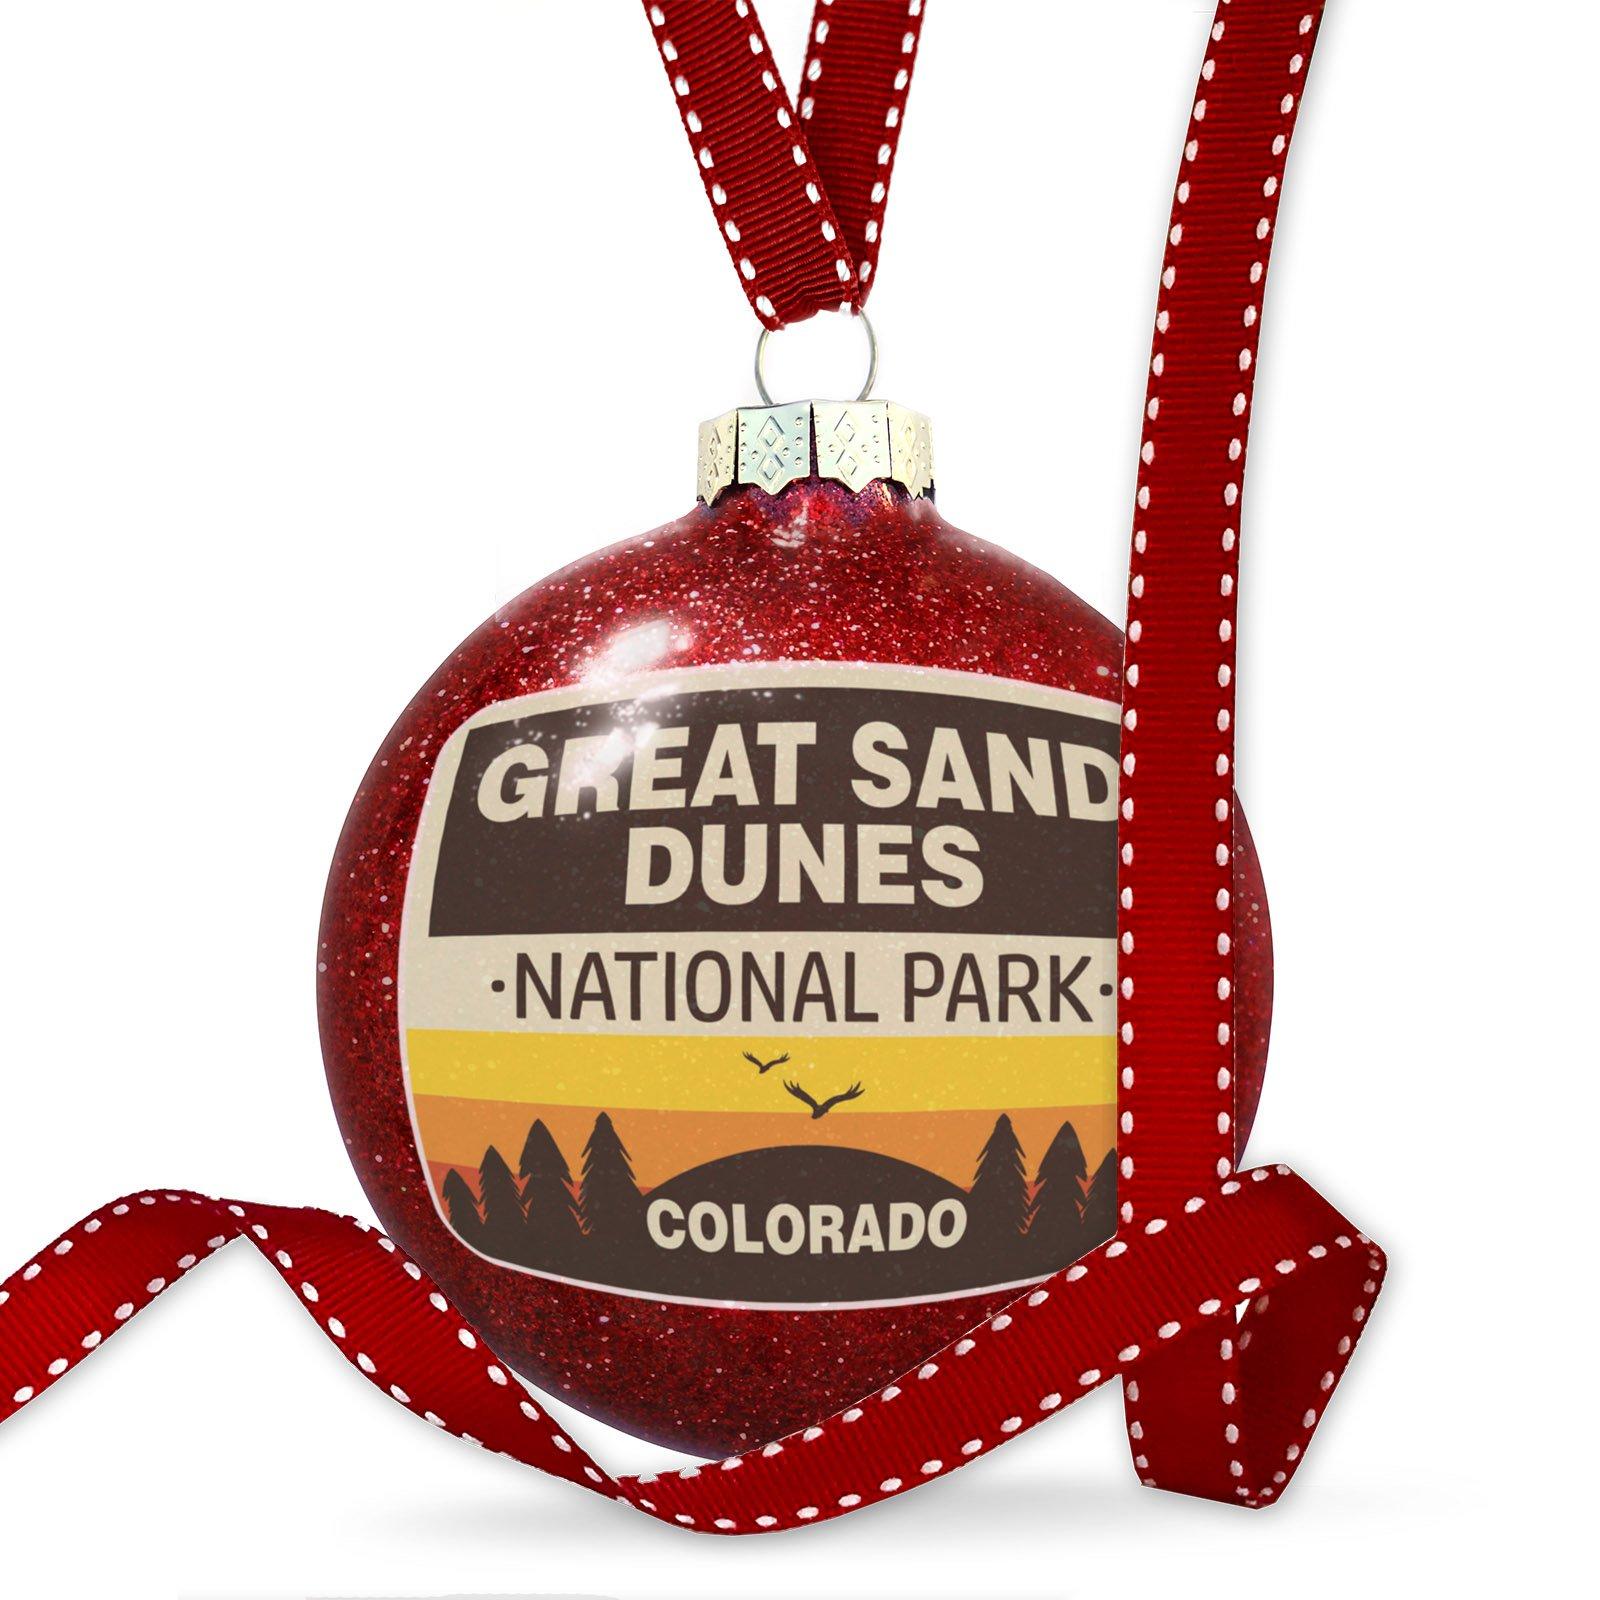 Christmas Decoration National Park Great Sand Dunes Ornament